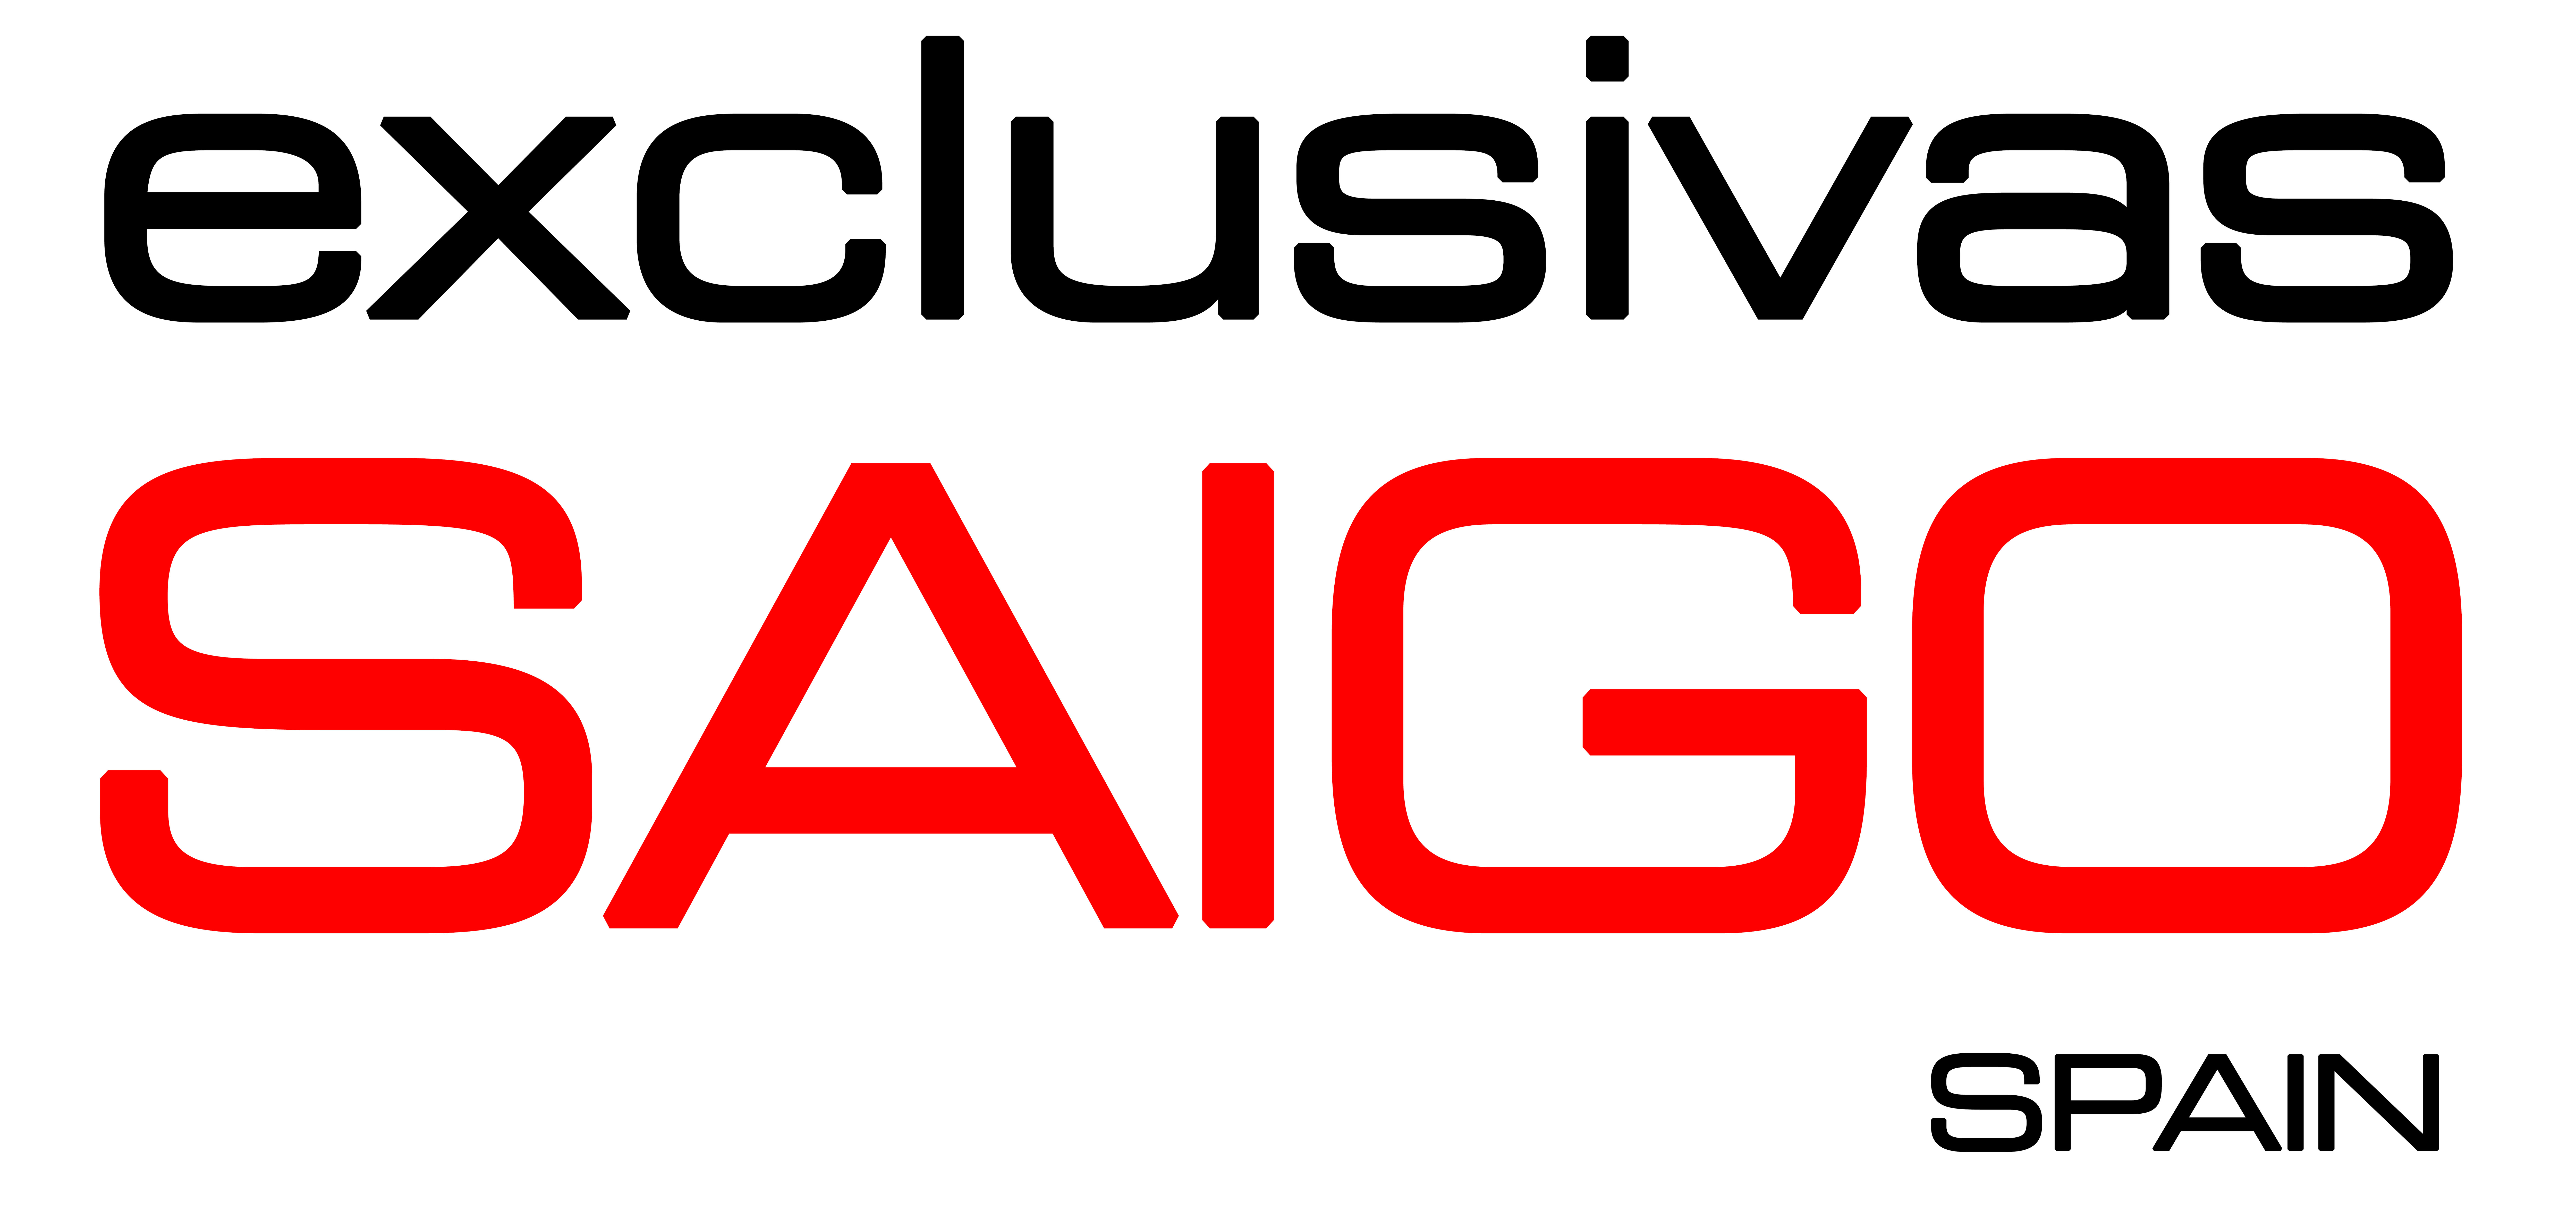 Exlusivas Saigo | Luxury Spain